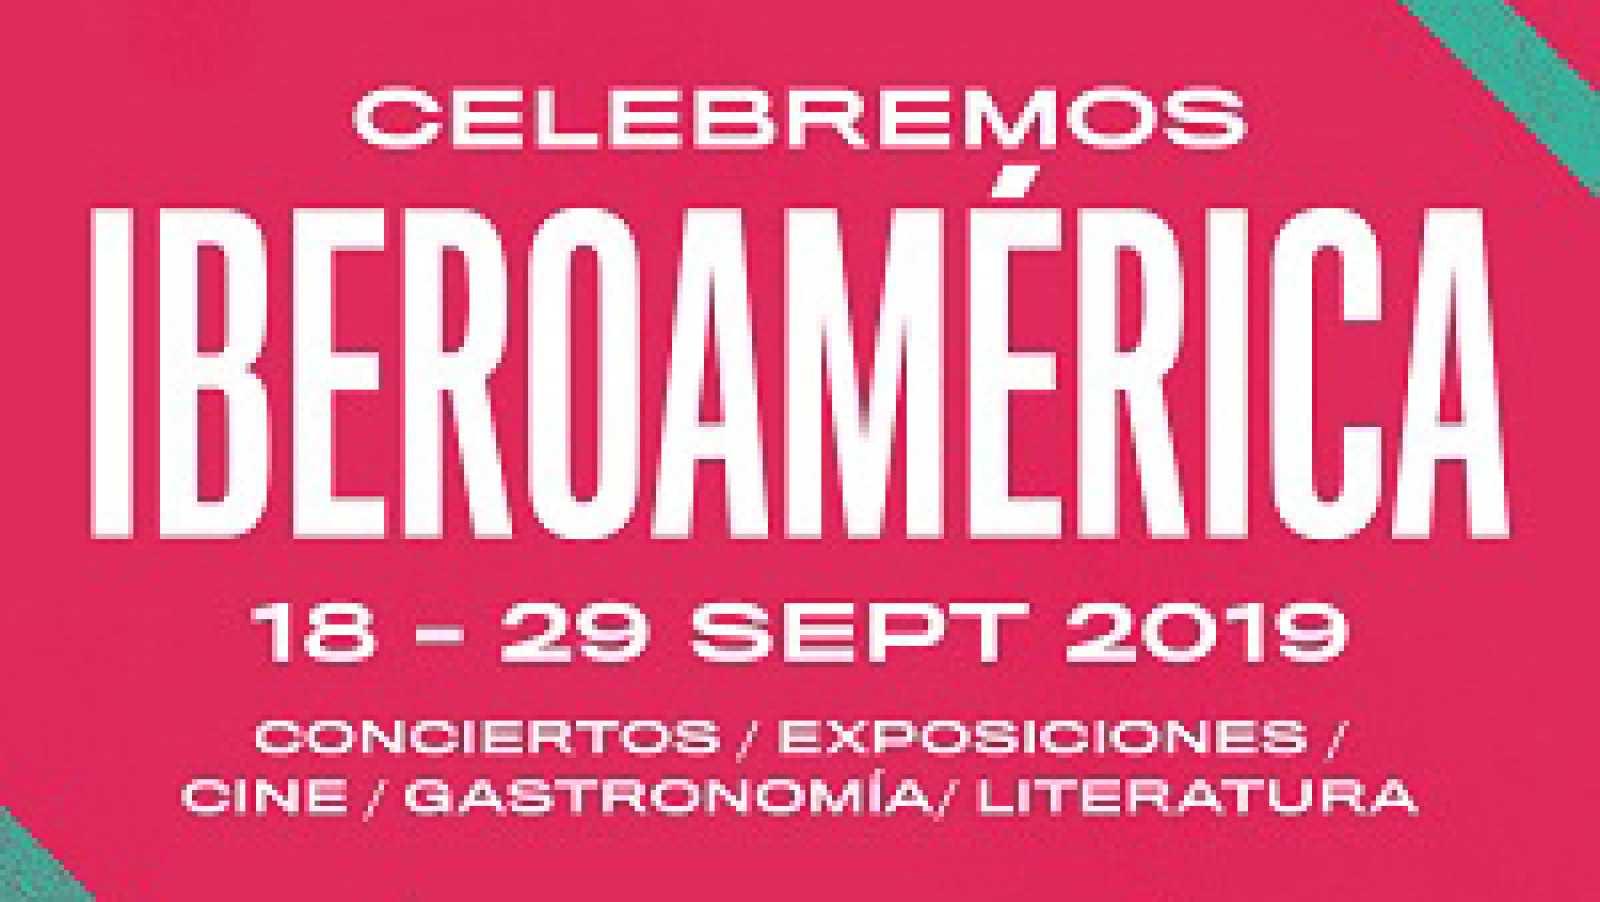 Hora América - Primer festival Celebremos Iberoamérica en Madrid, con más de 100 actividades - 17/09/19 - escuchar ahora